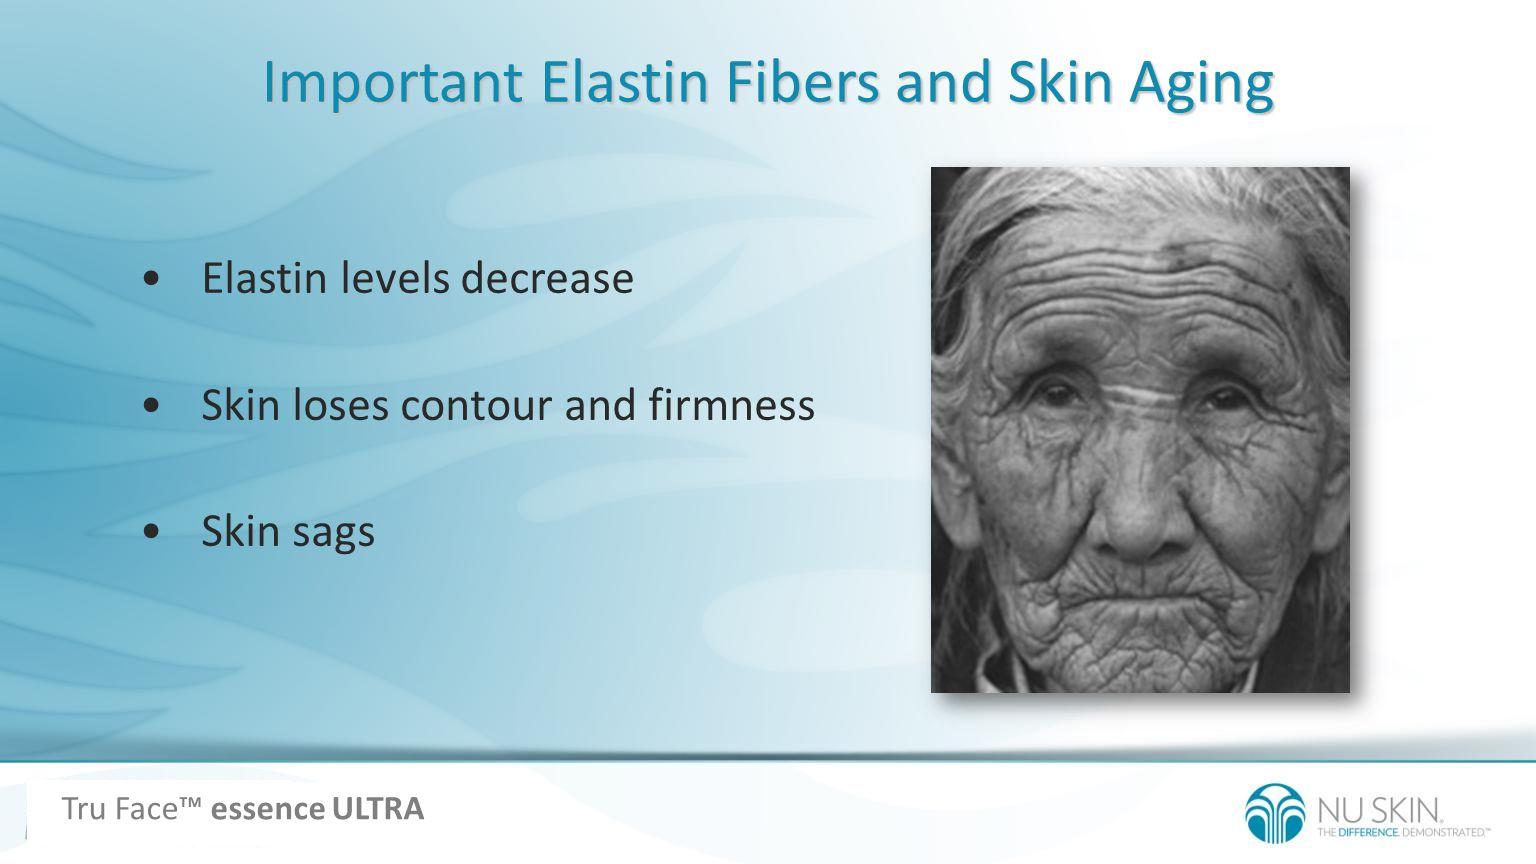 Important Elastin Fibers and Skin Aging Elastin levels decrease Skin loses contour and firmness Skin sags Tru Face essence ULTRA